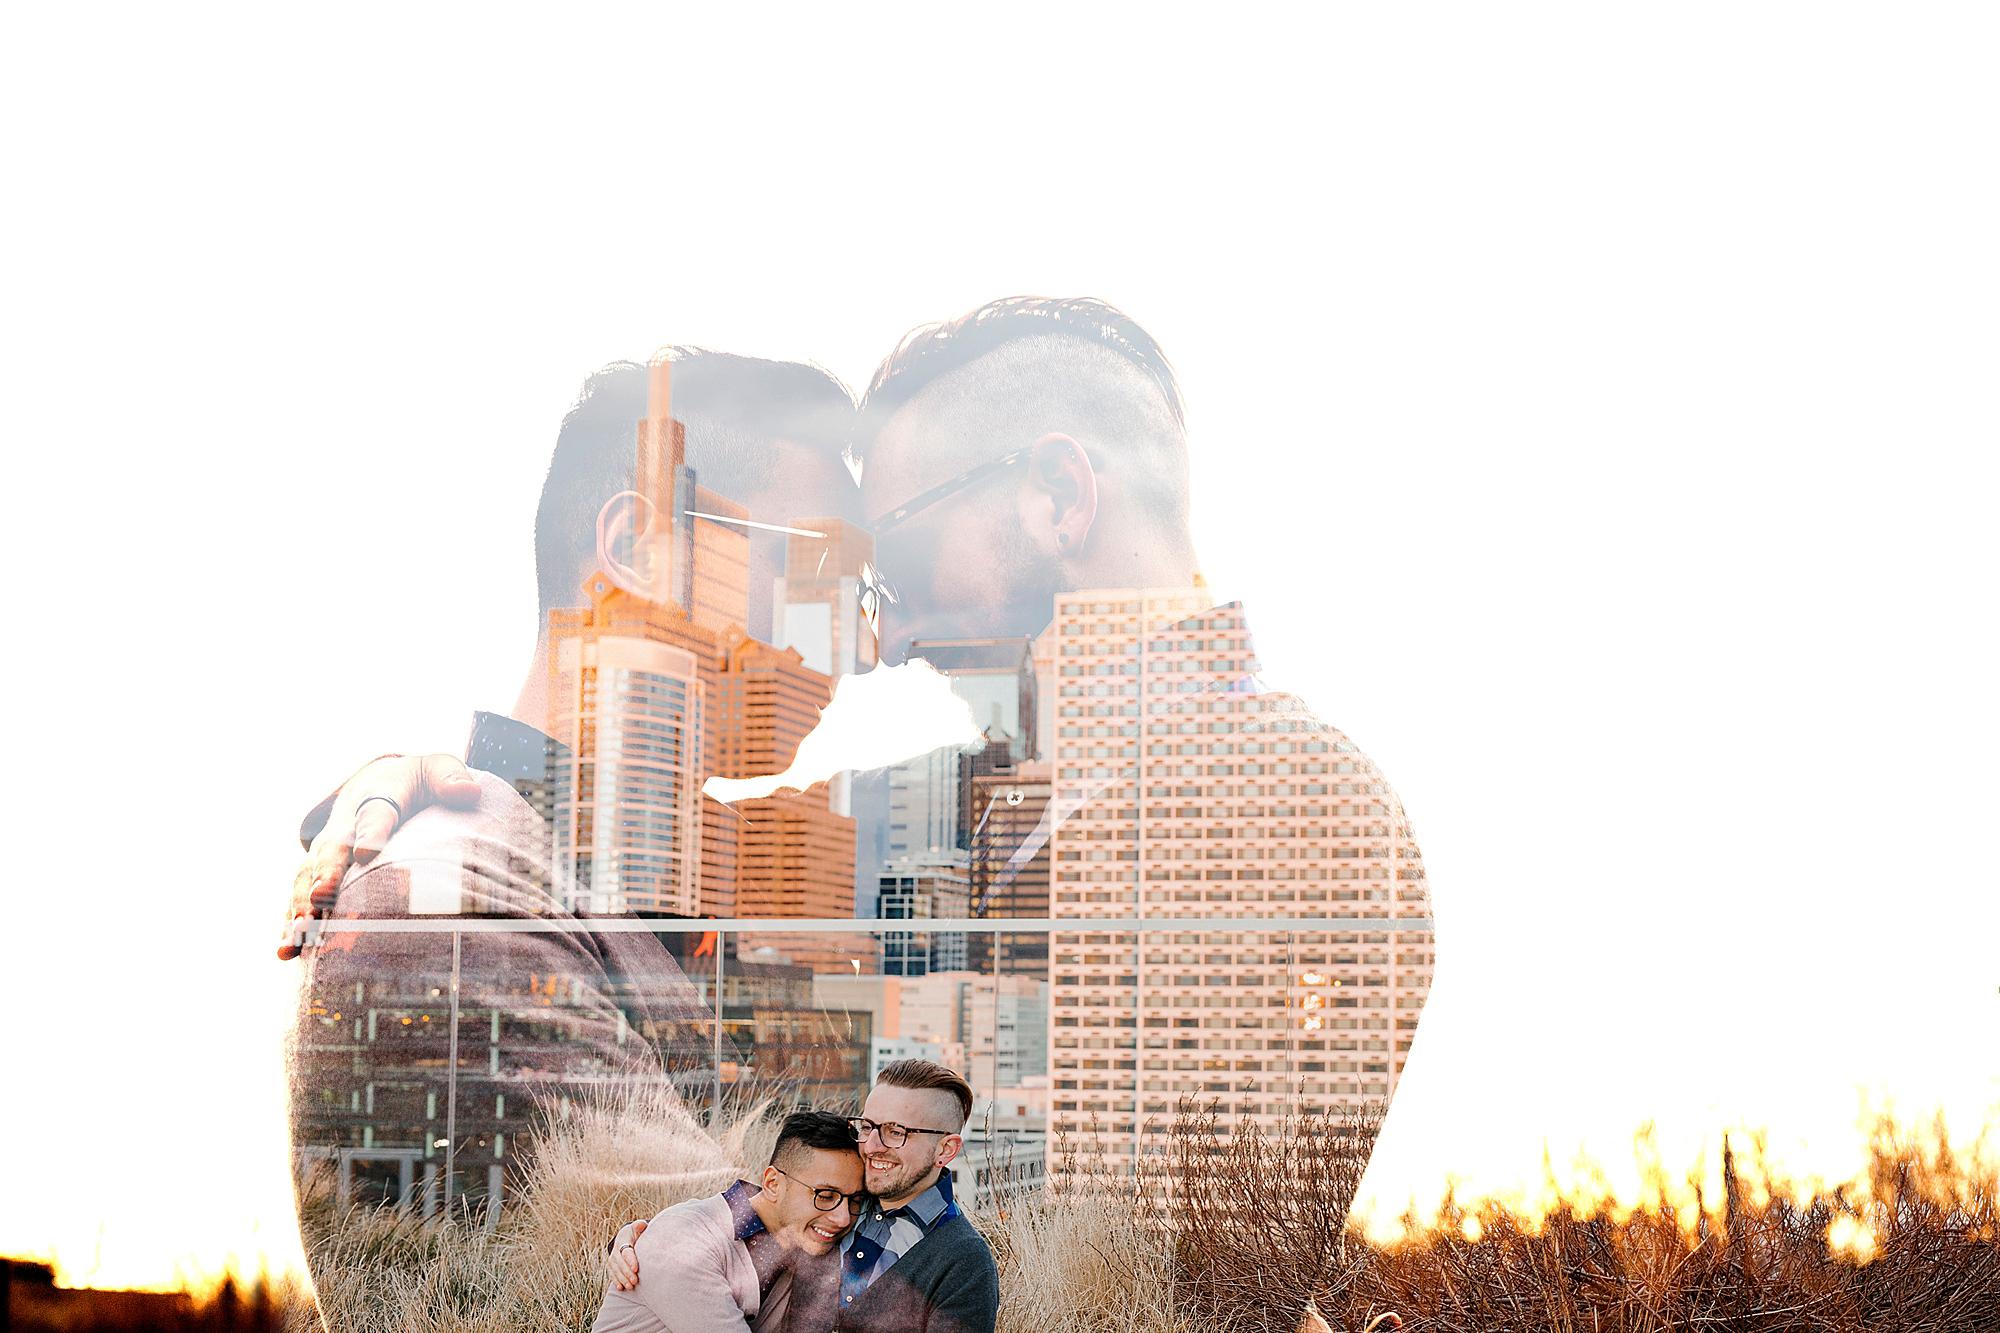 Joe_mac_Creative_Best_Philadelphia_Wedding_photography_Gay_LGBTQ_Queer_Two_Grooms_0066.jpg